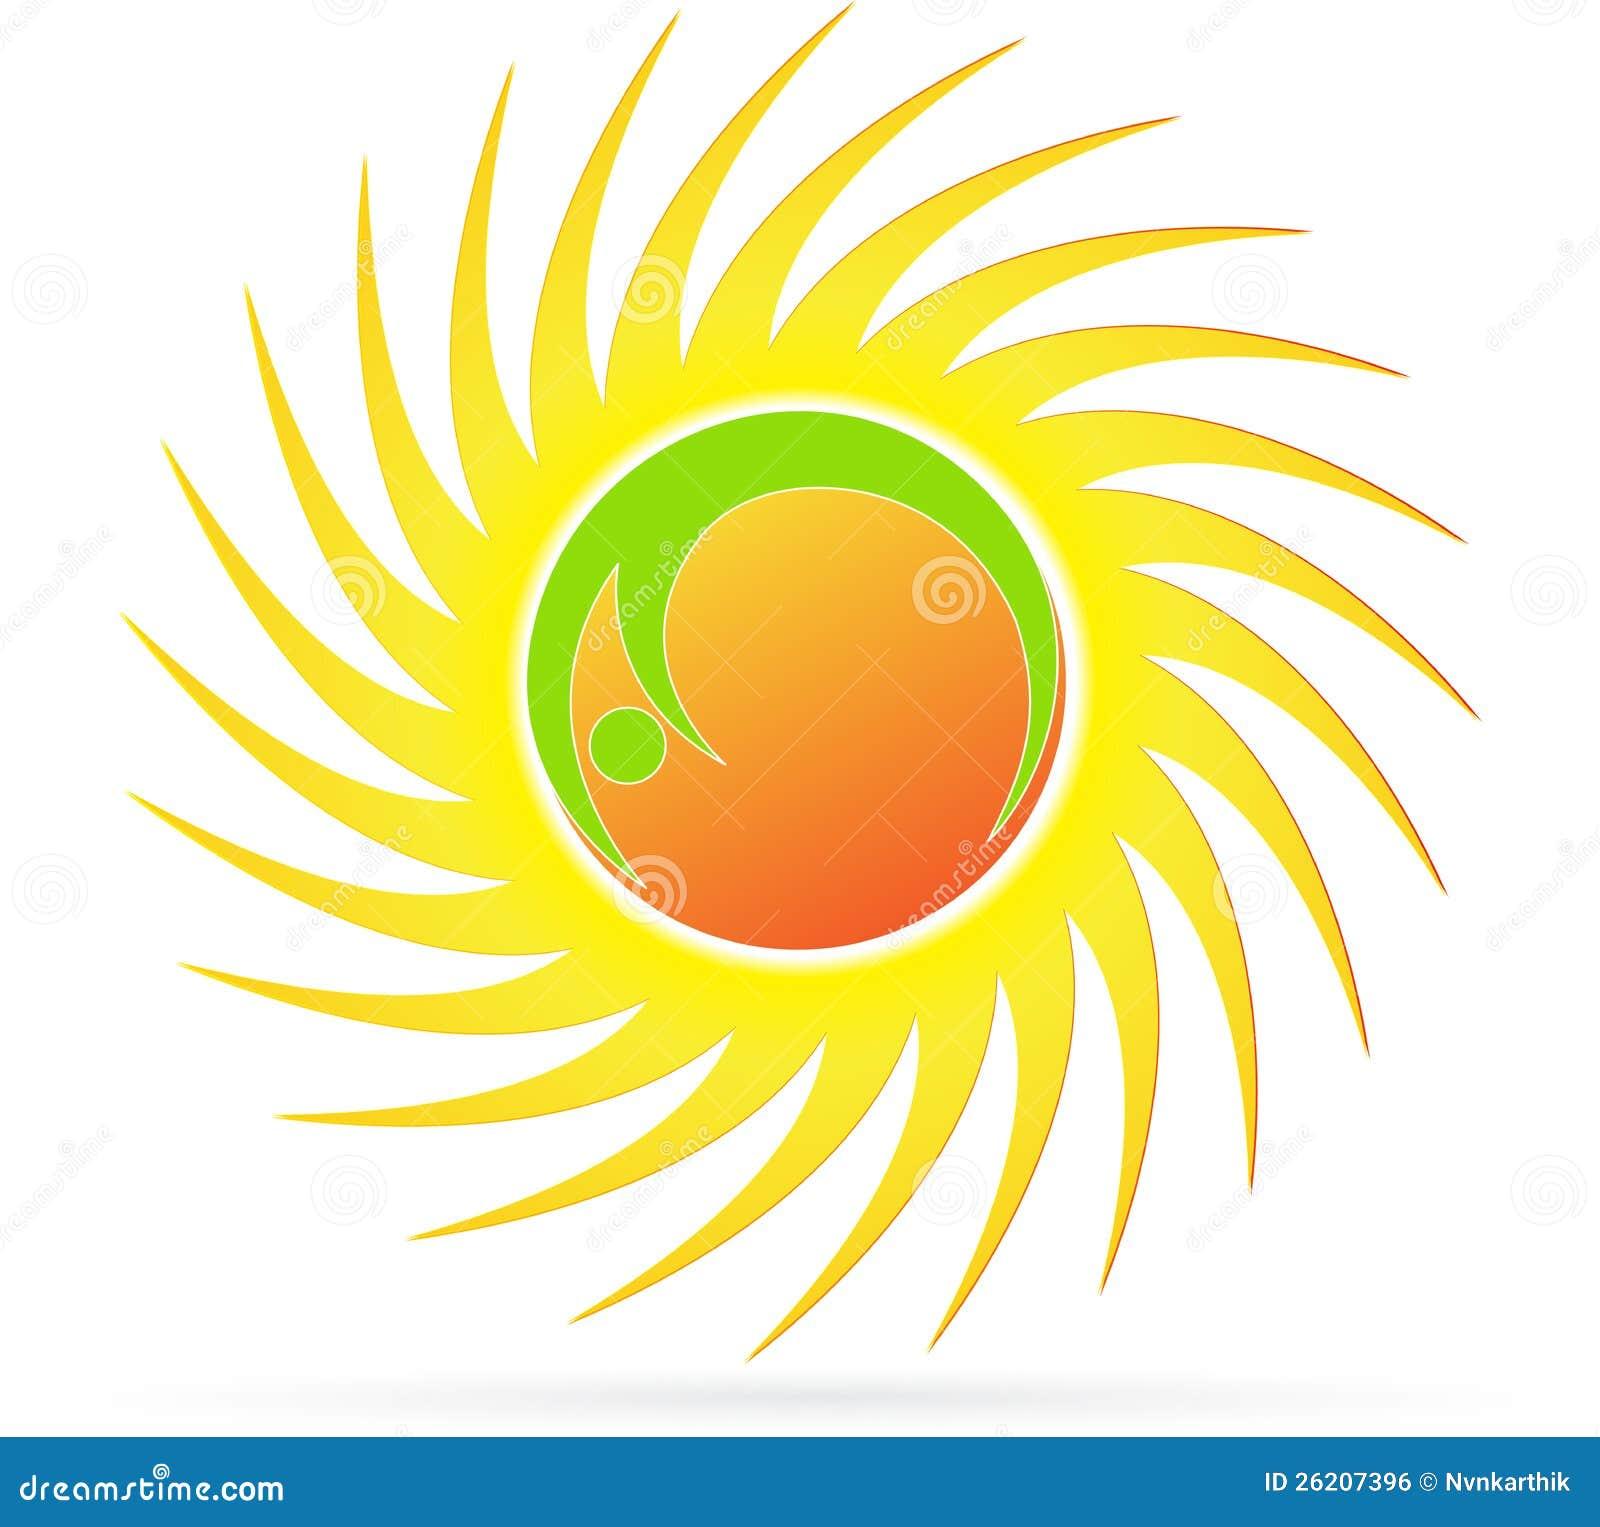 Sun Logo Royalty Free Stock Image - Image: 26207396